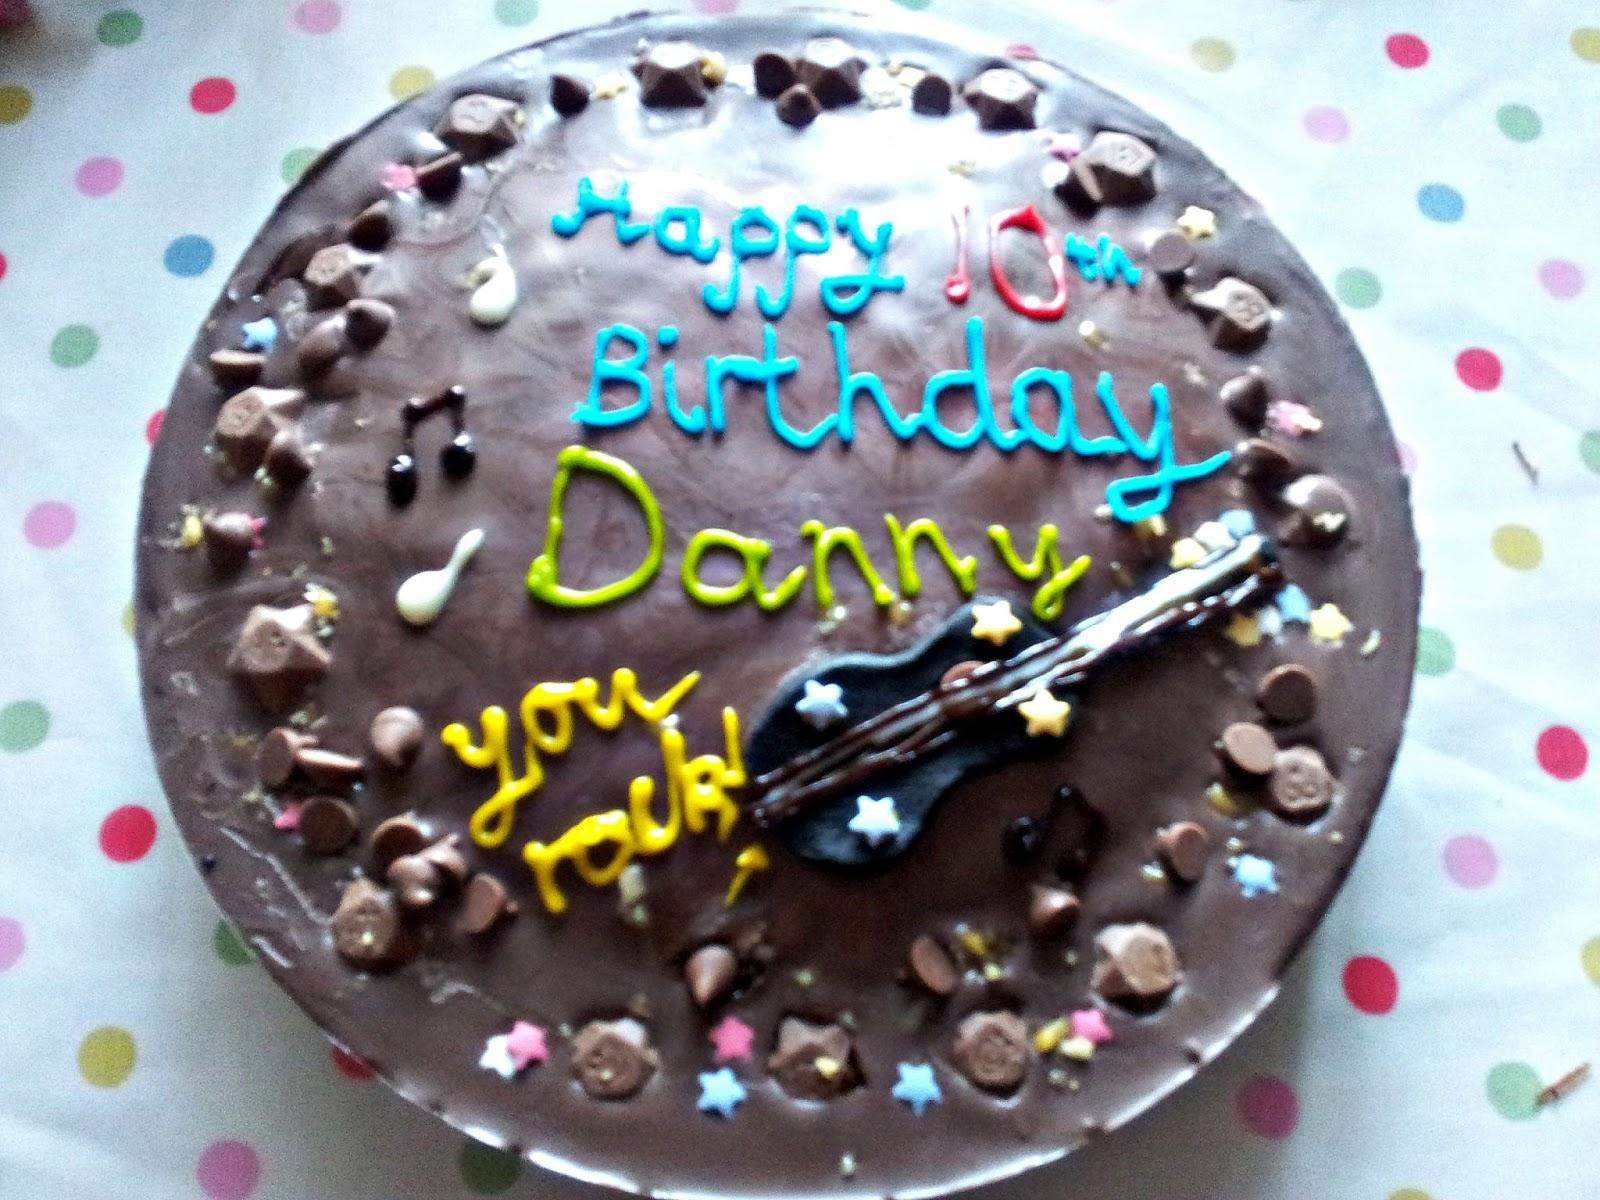 Danny S Birthday Cake Creative Baking With Kids Cbias